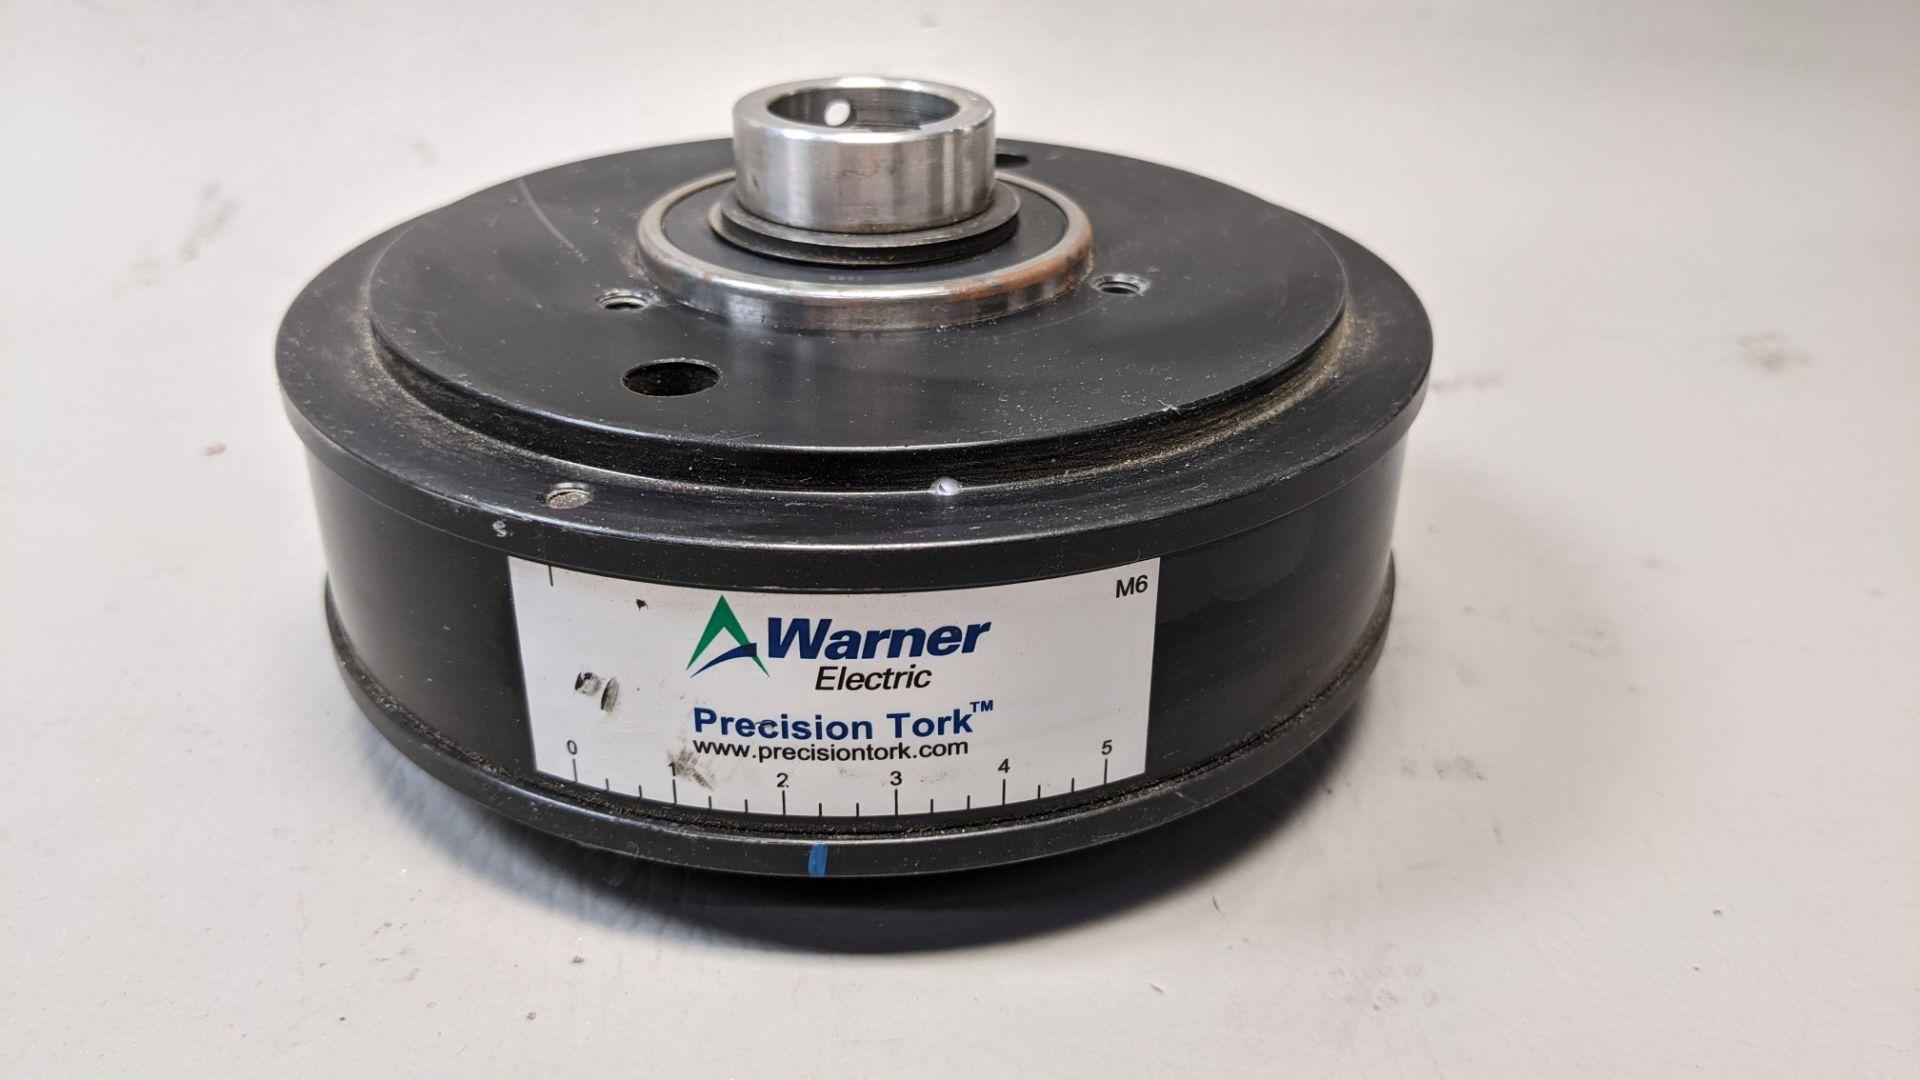 WARNER ELECTRIC PRECISION TORK MAGNETIC CLUTCH